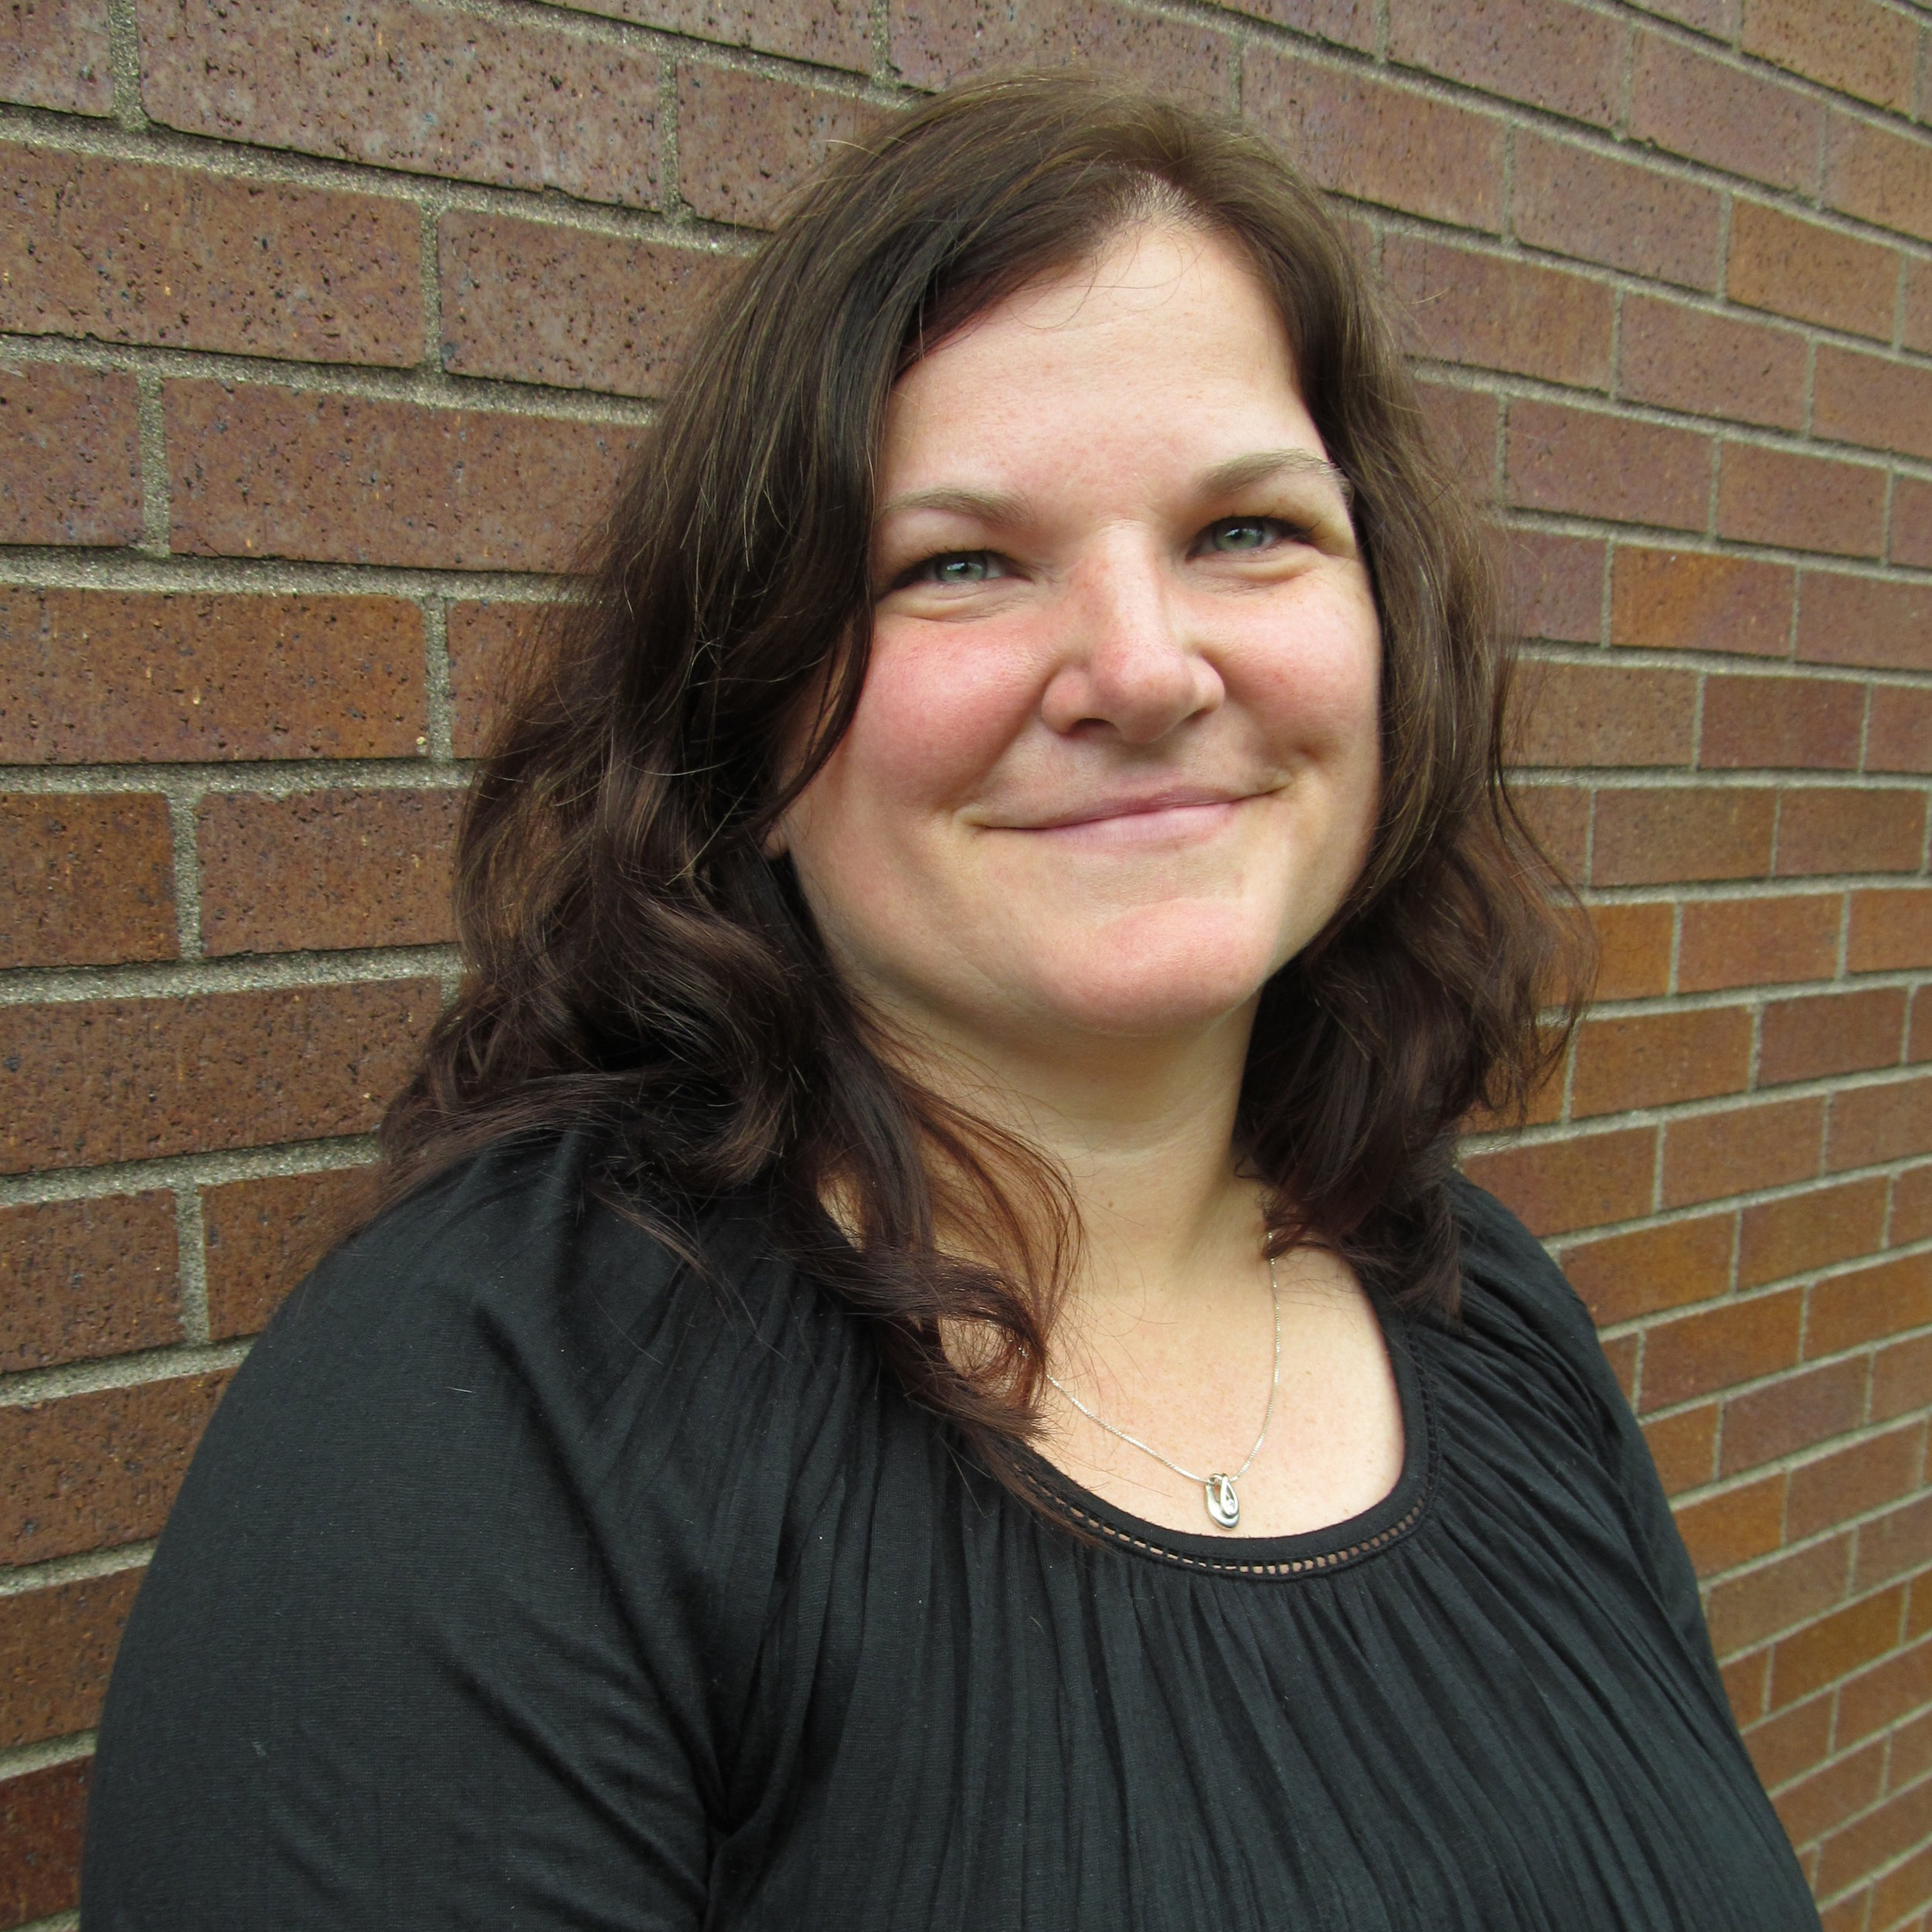 Stephanie Larson - Community Living Specialist